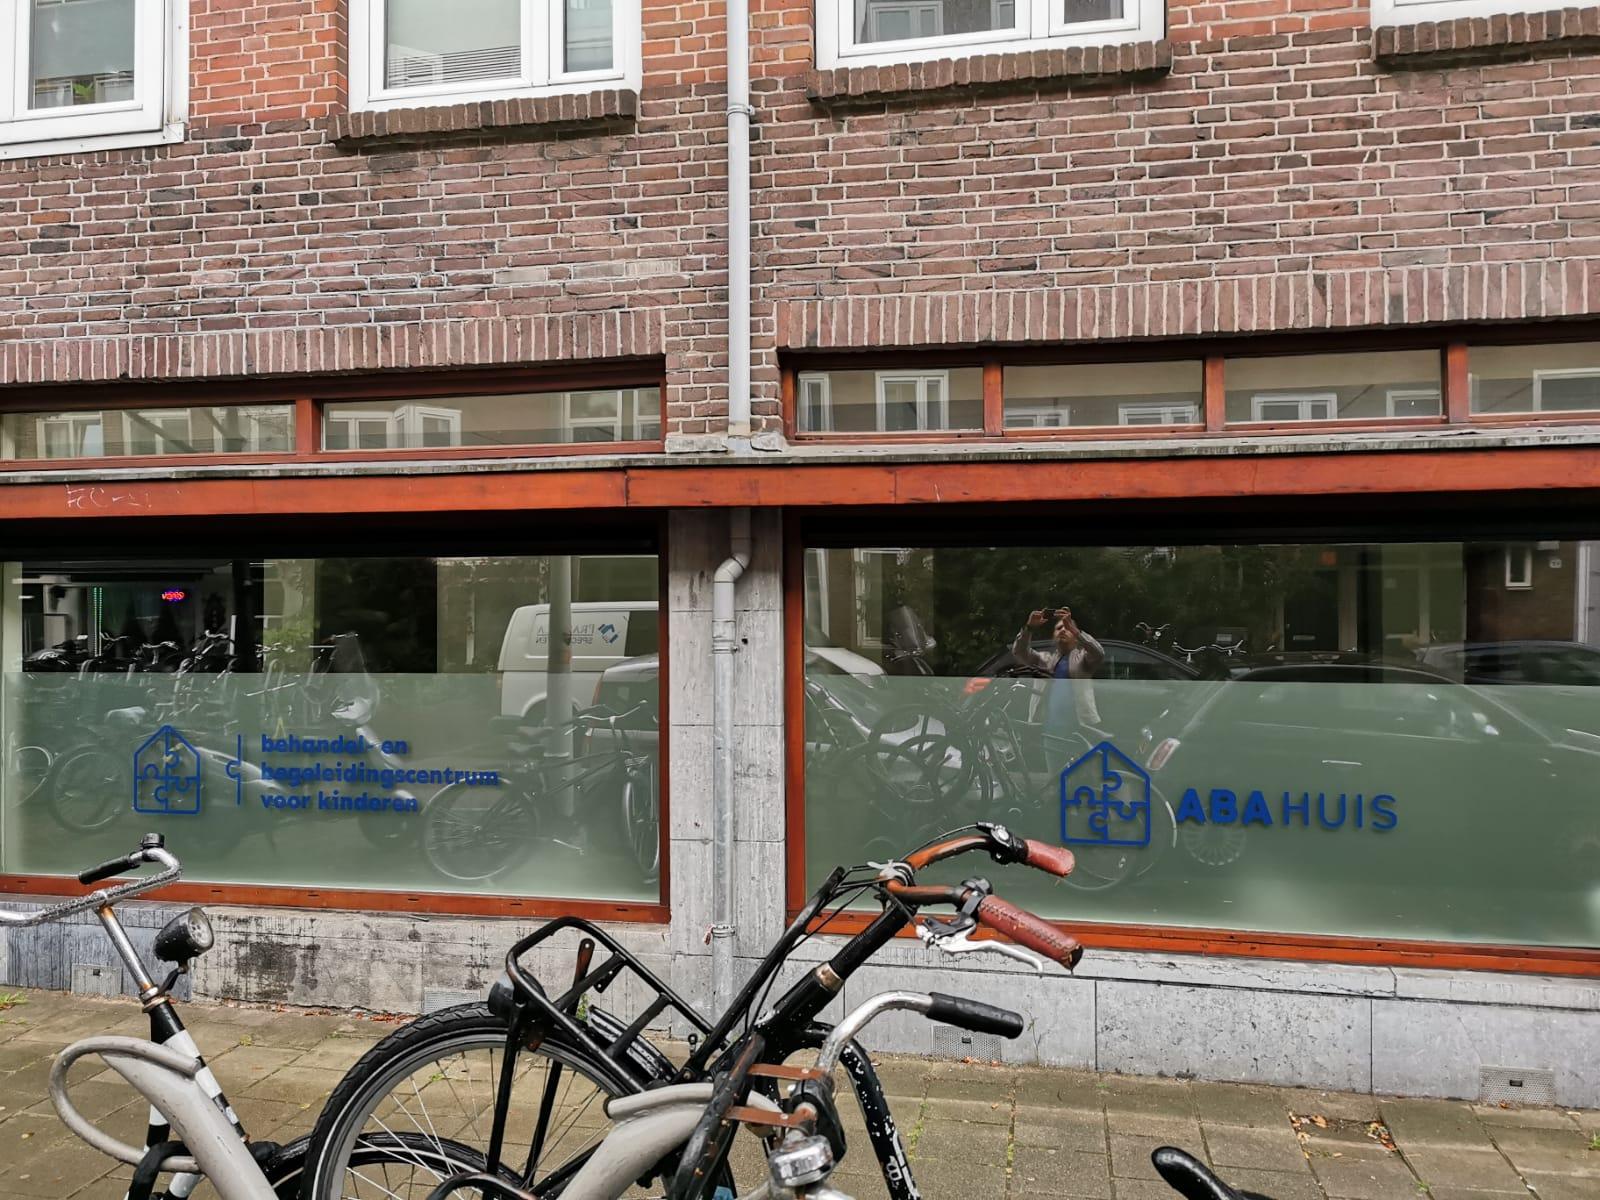 Het ABA Huis in Amsterdam